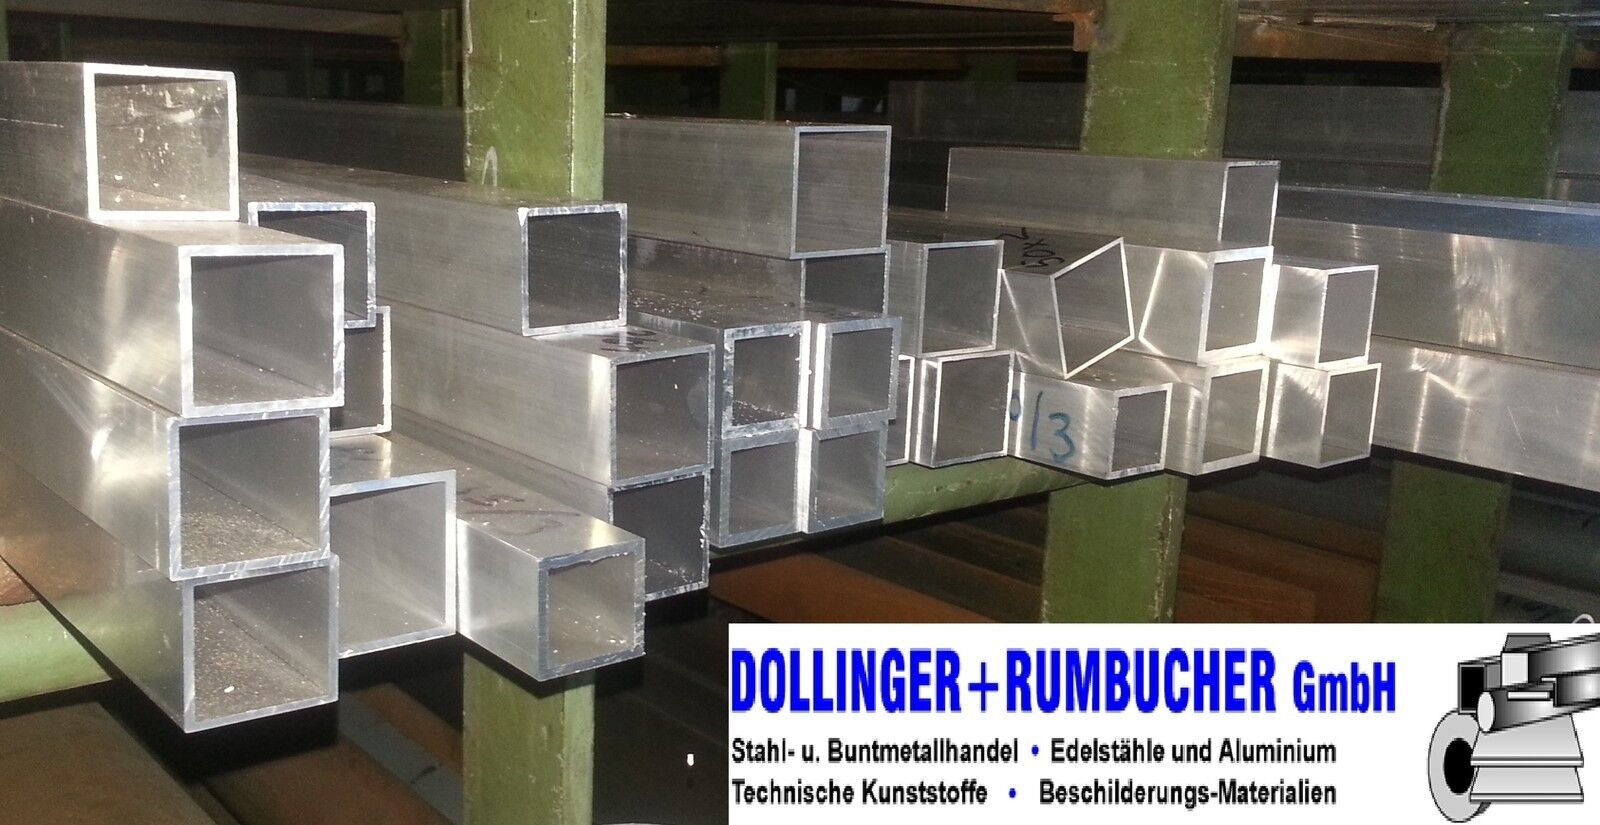 aluminium aluminiumrohr vierkantrohr alu vierkant rohr 15 x 15 x 2 mm eur 1 00 picclick de. Black Bedroom Furniture Sets. Home Design Ideas